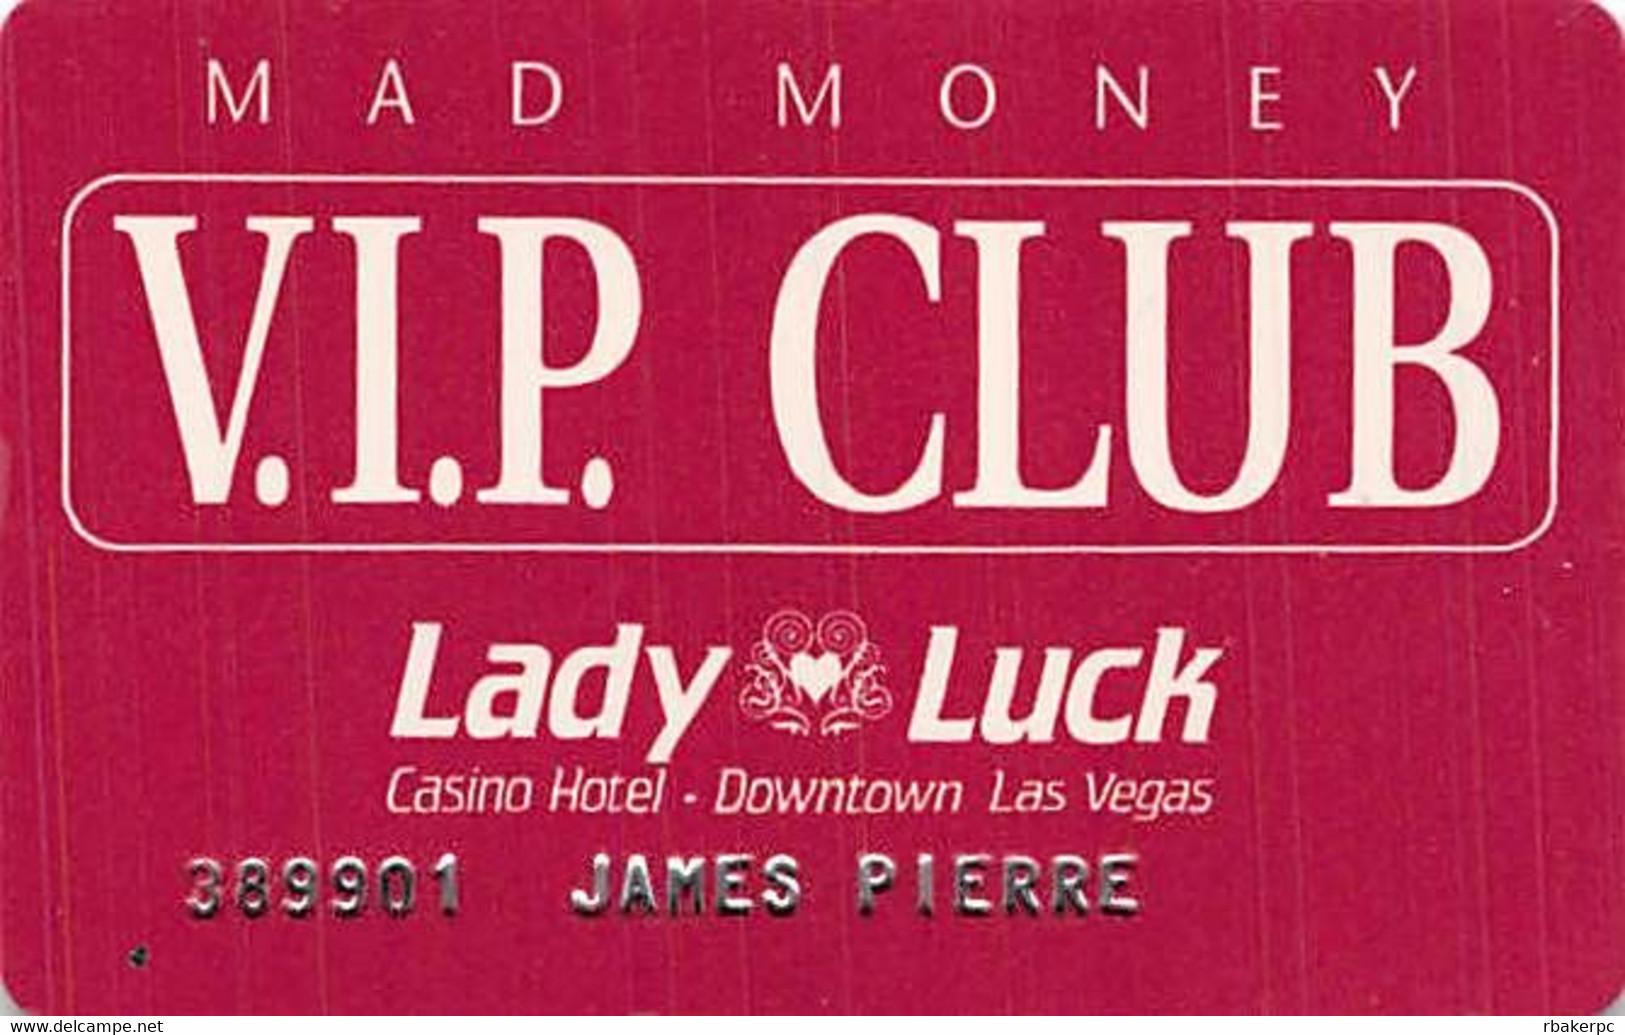 Lady Luck Casino Las Vegas, NV - Embossed VIP Club Slot Card - Casino Cards